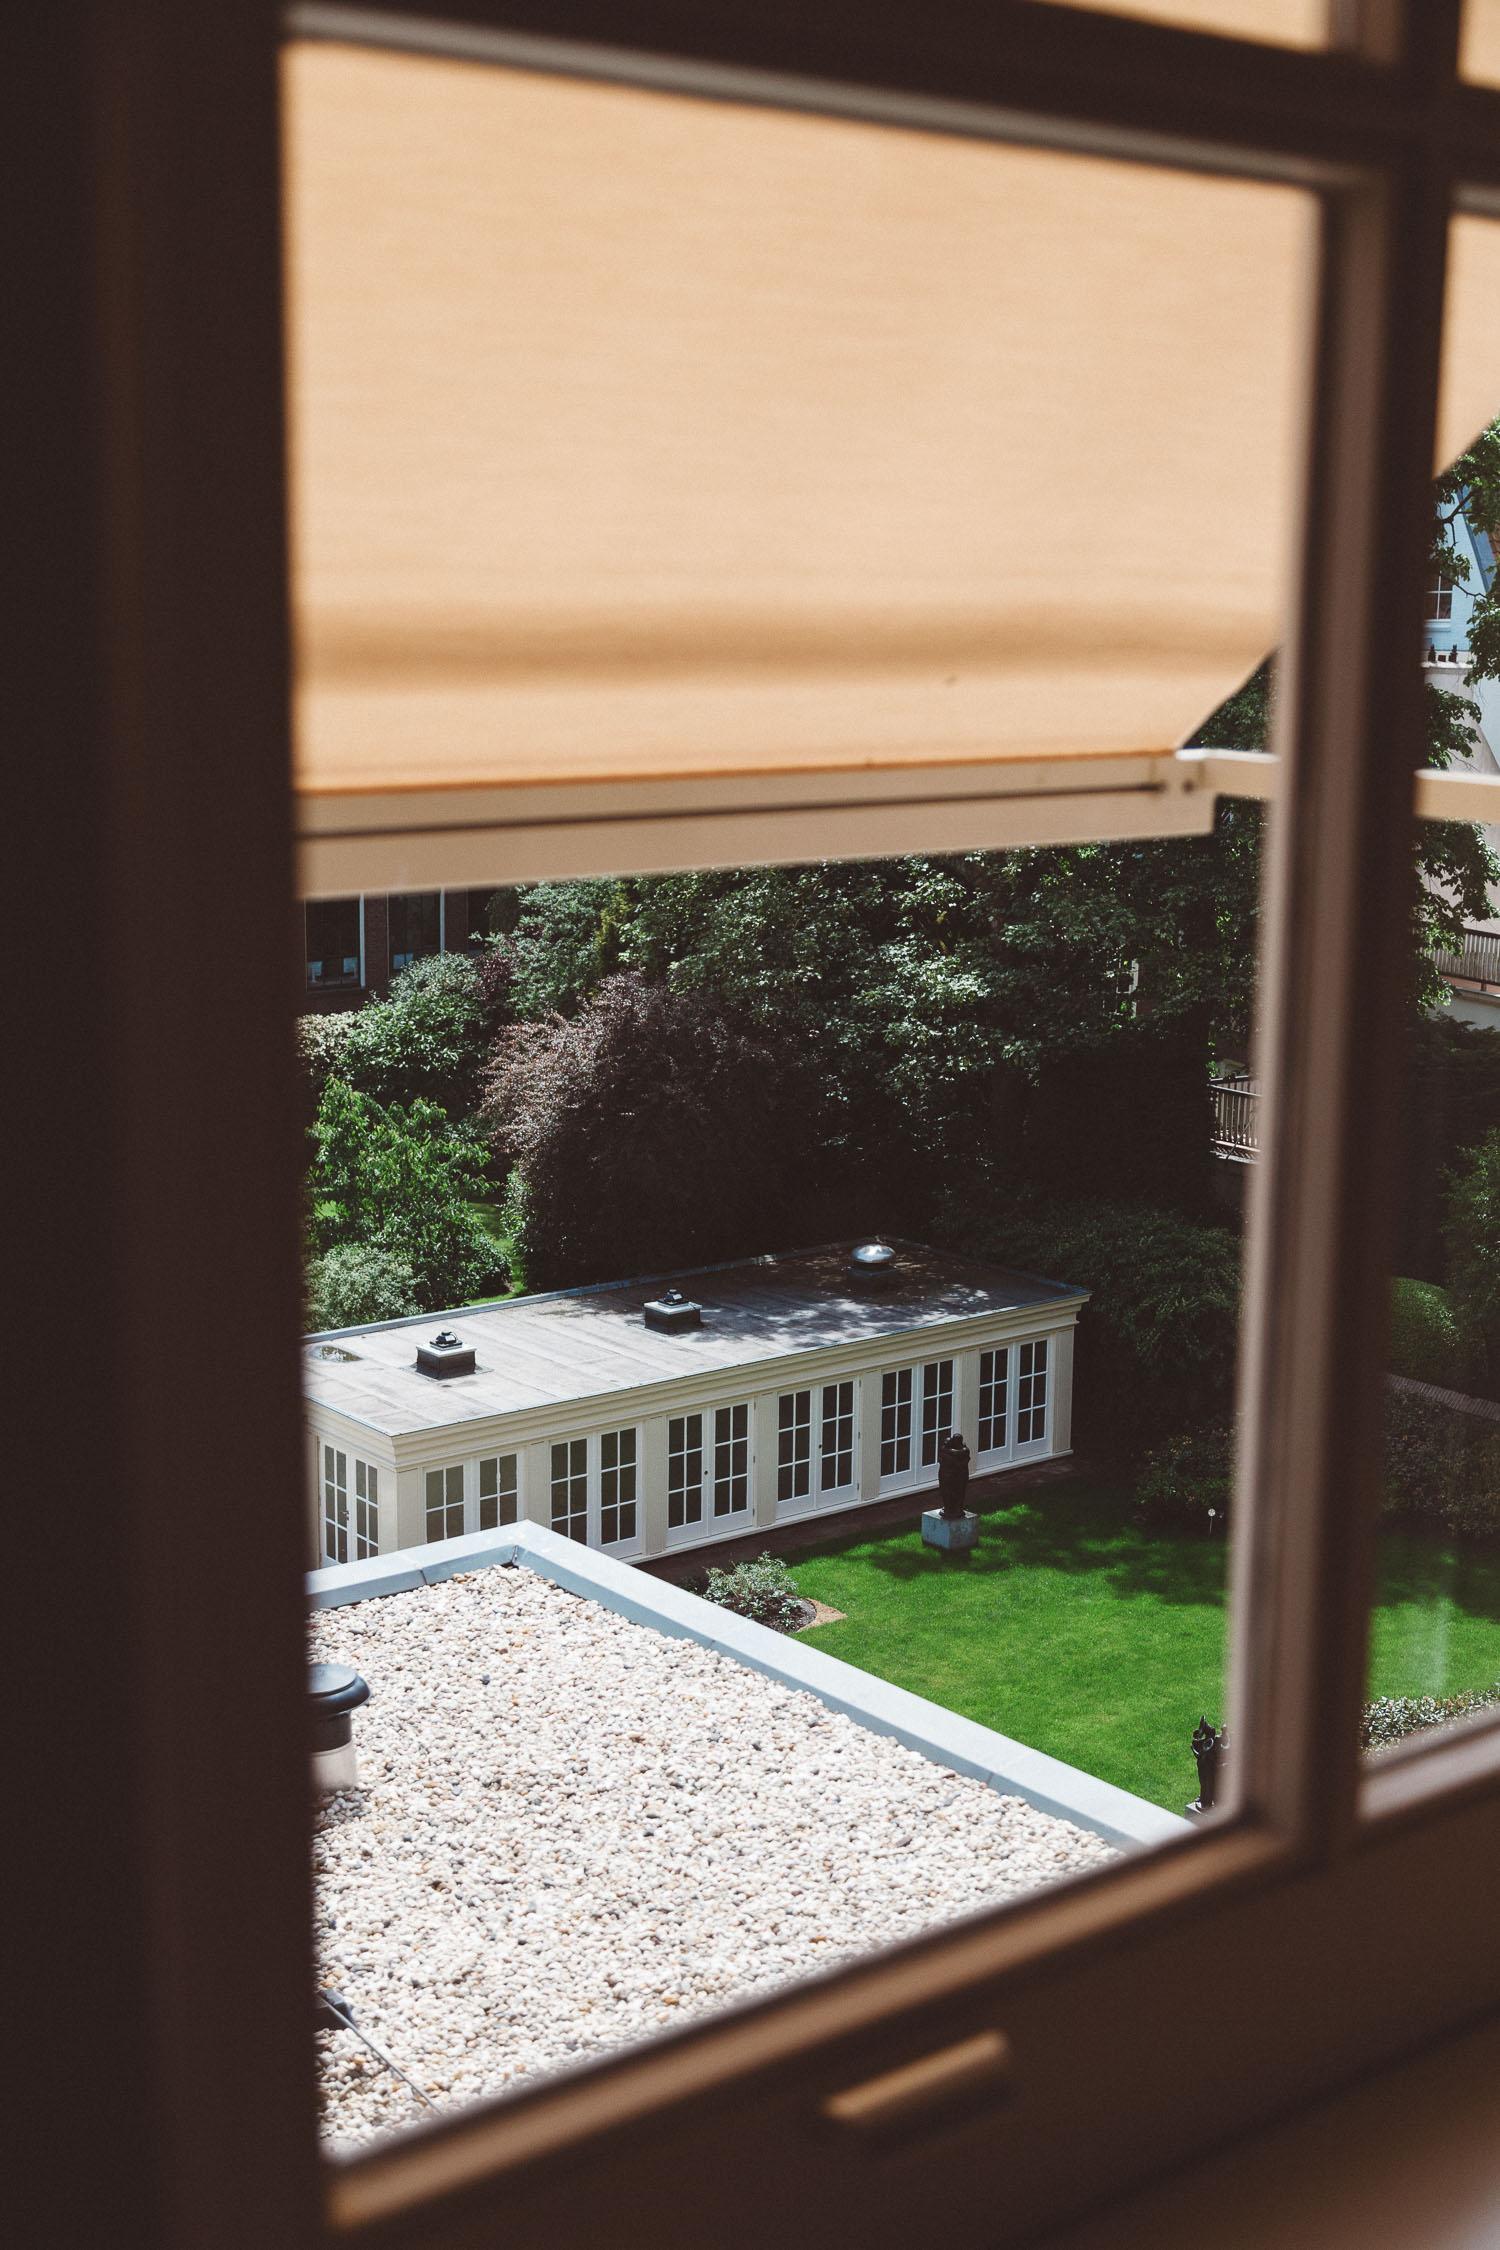 Backyard-wedding-Bruiloft-Annemiek-David-fotografie-photography-On-a-hazy-morning-Amsterdam-The-Netherlands042.jpg